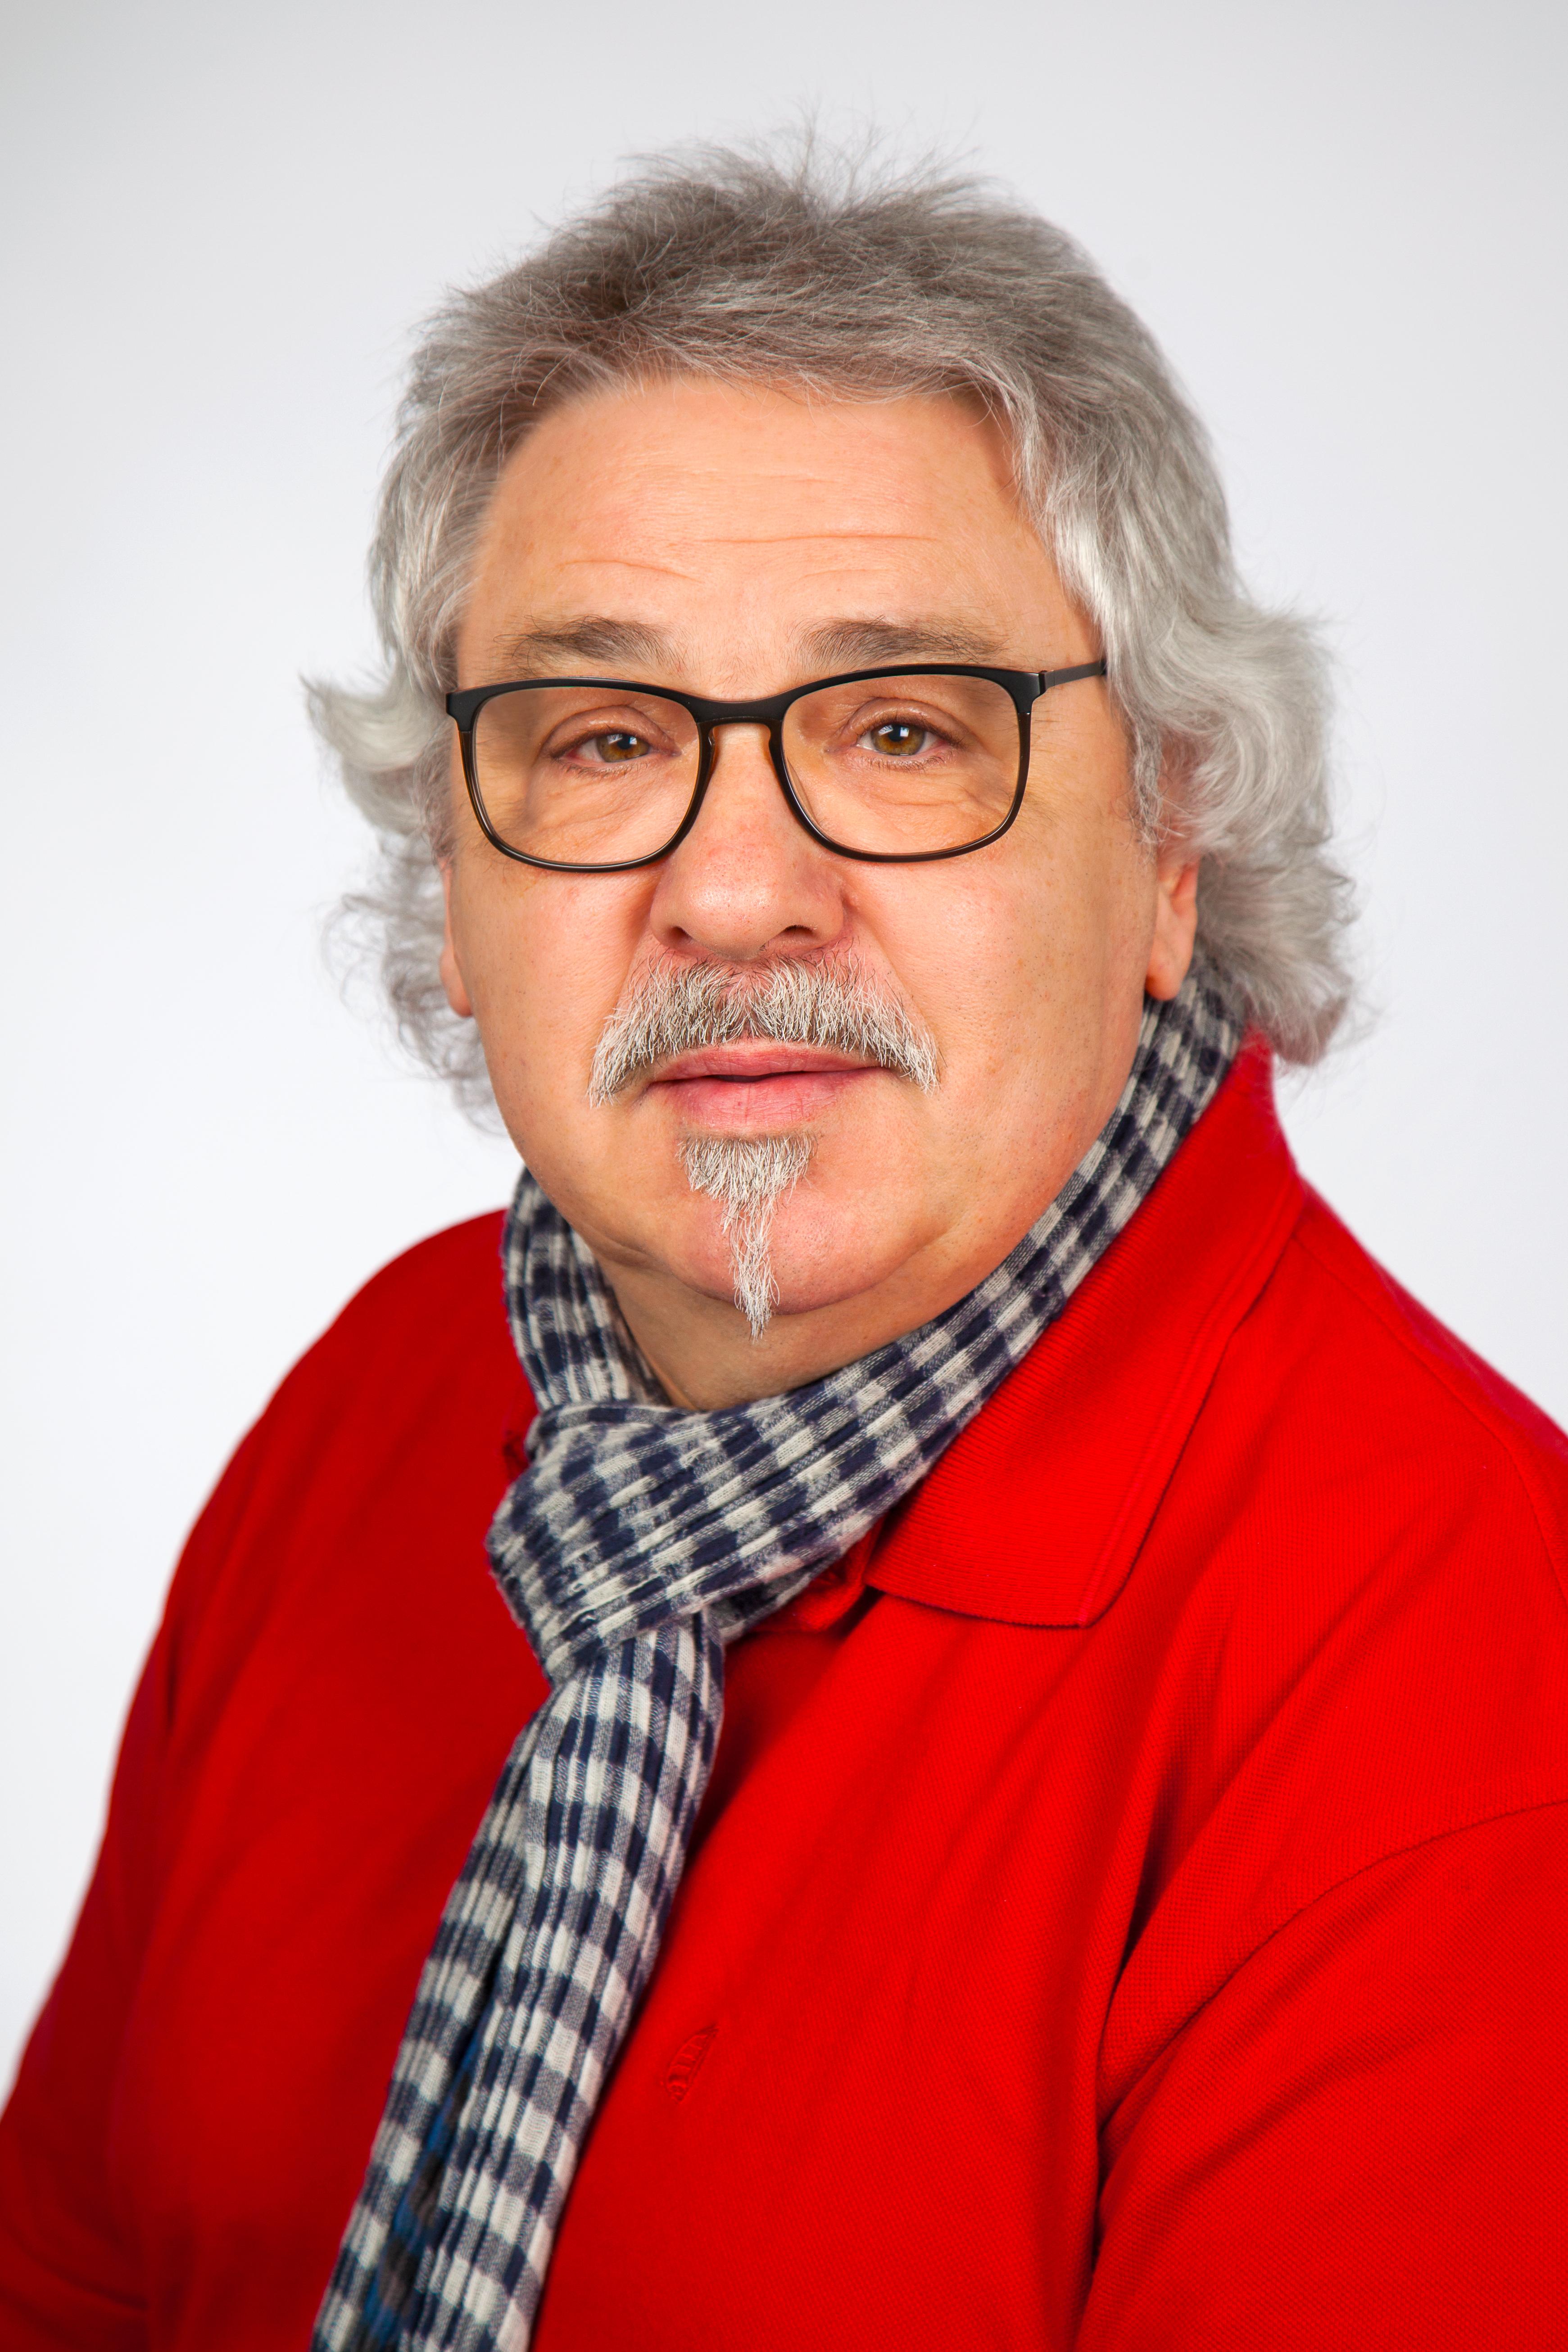 Hospiz Salzgitter Dietmar Froböse